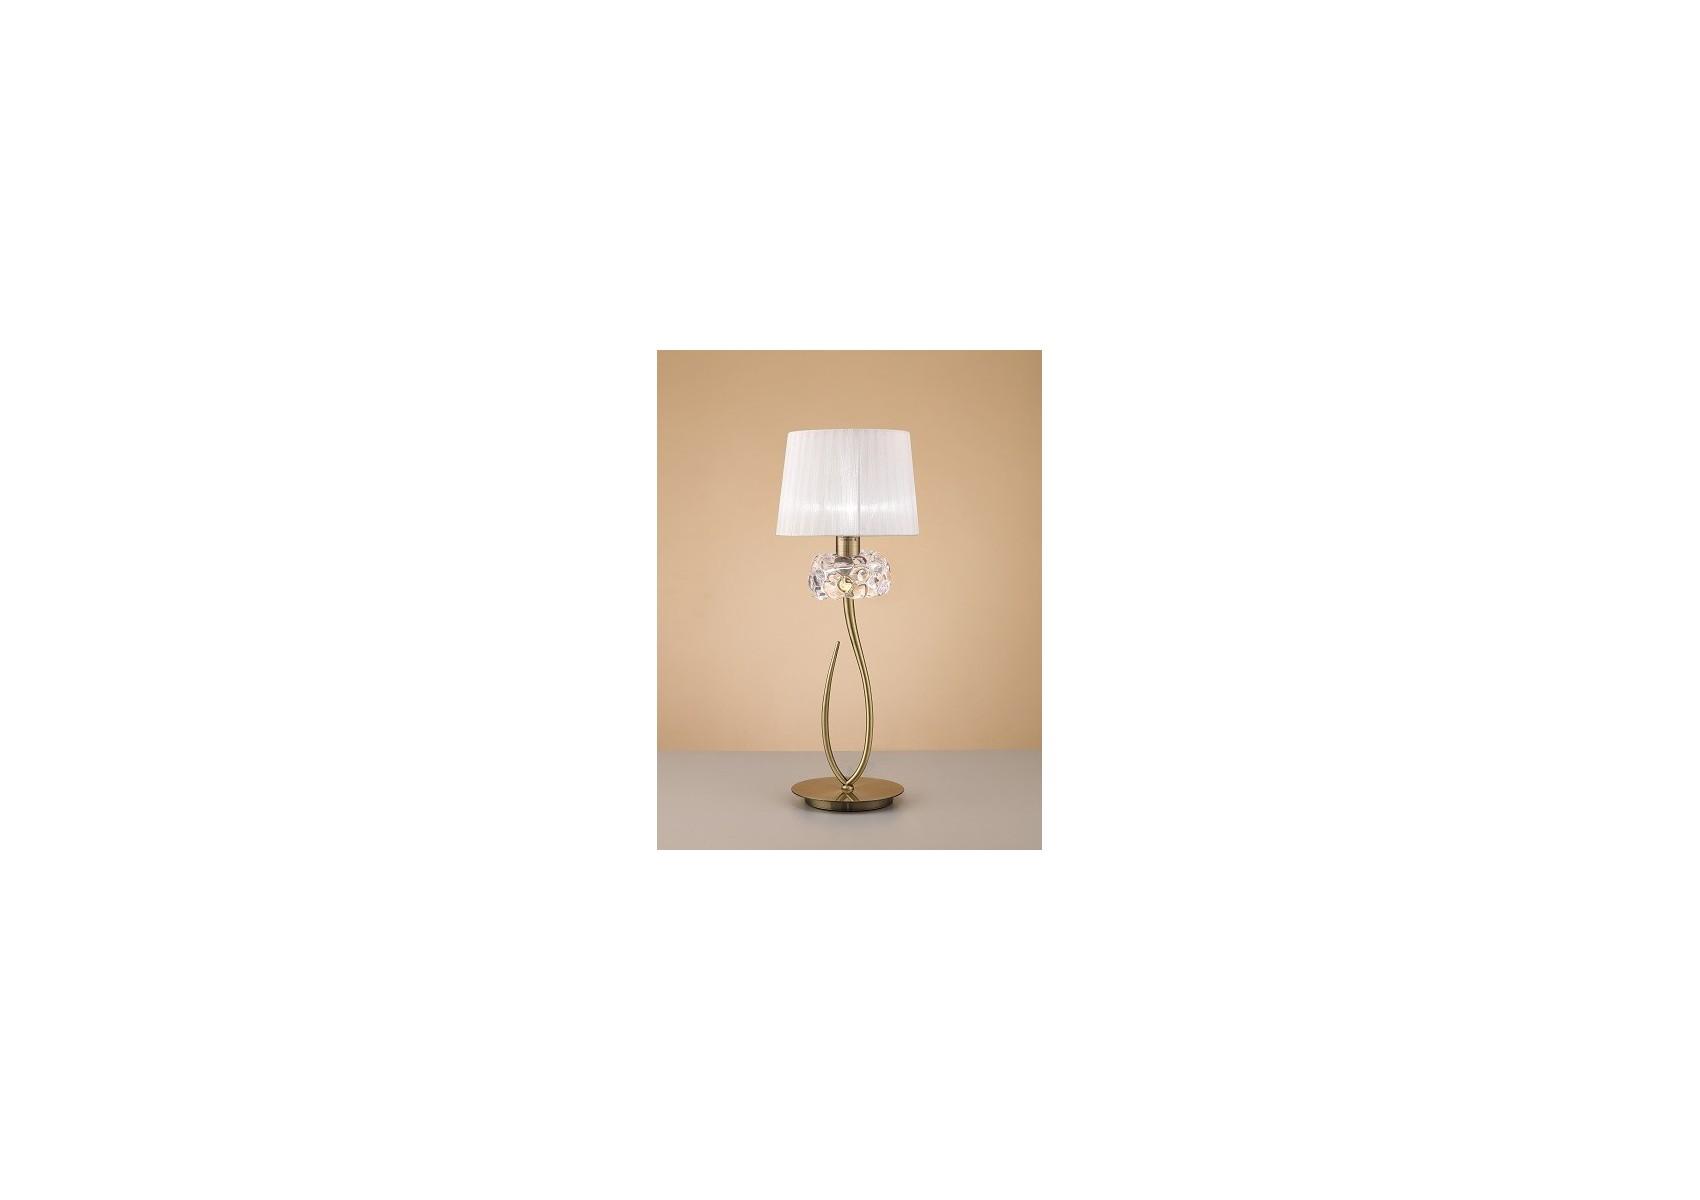 grande lampe de table design loewe 1 lampe boite 224 design